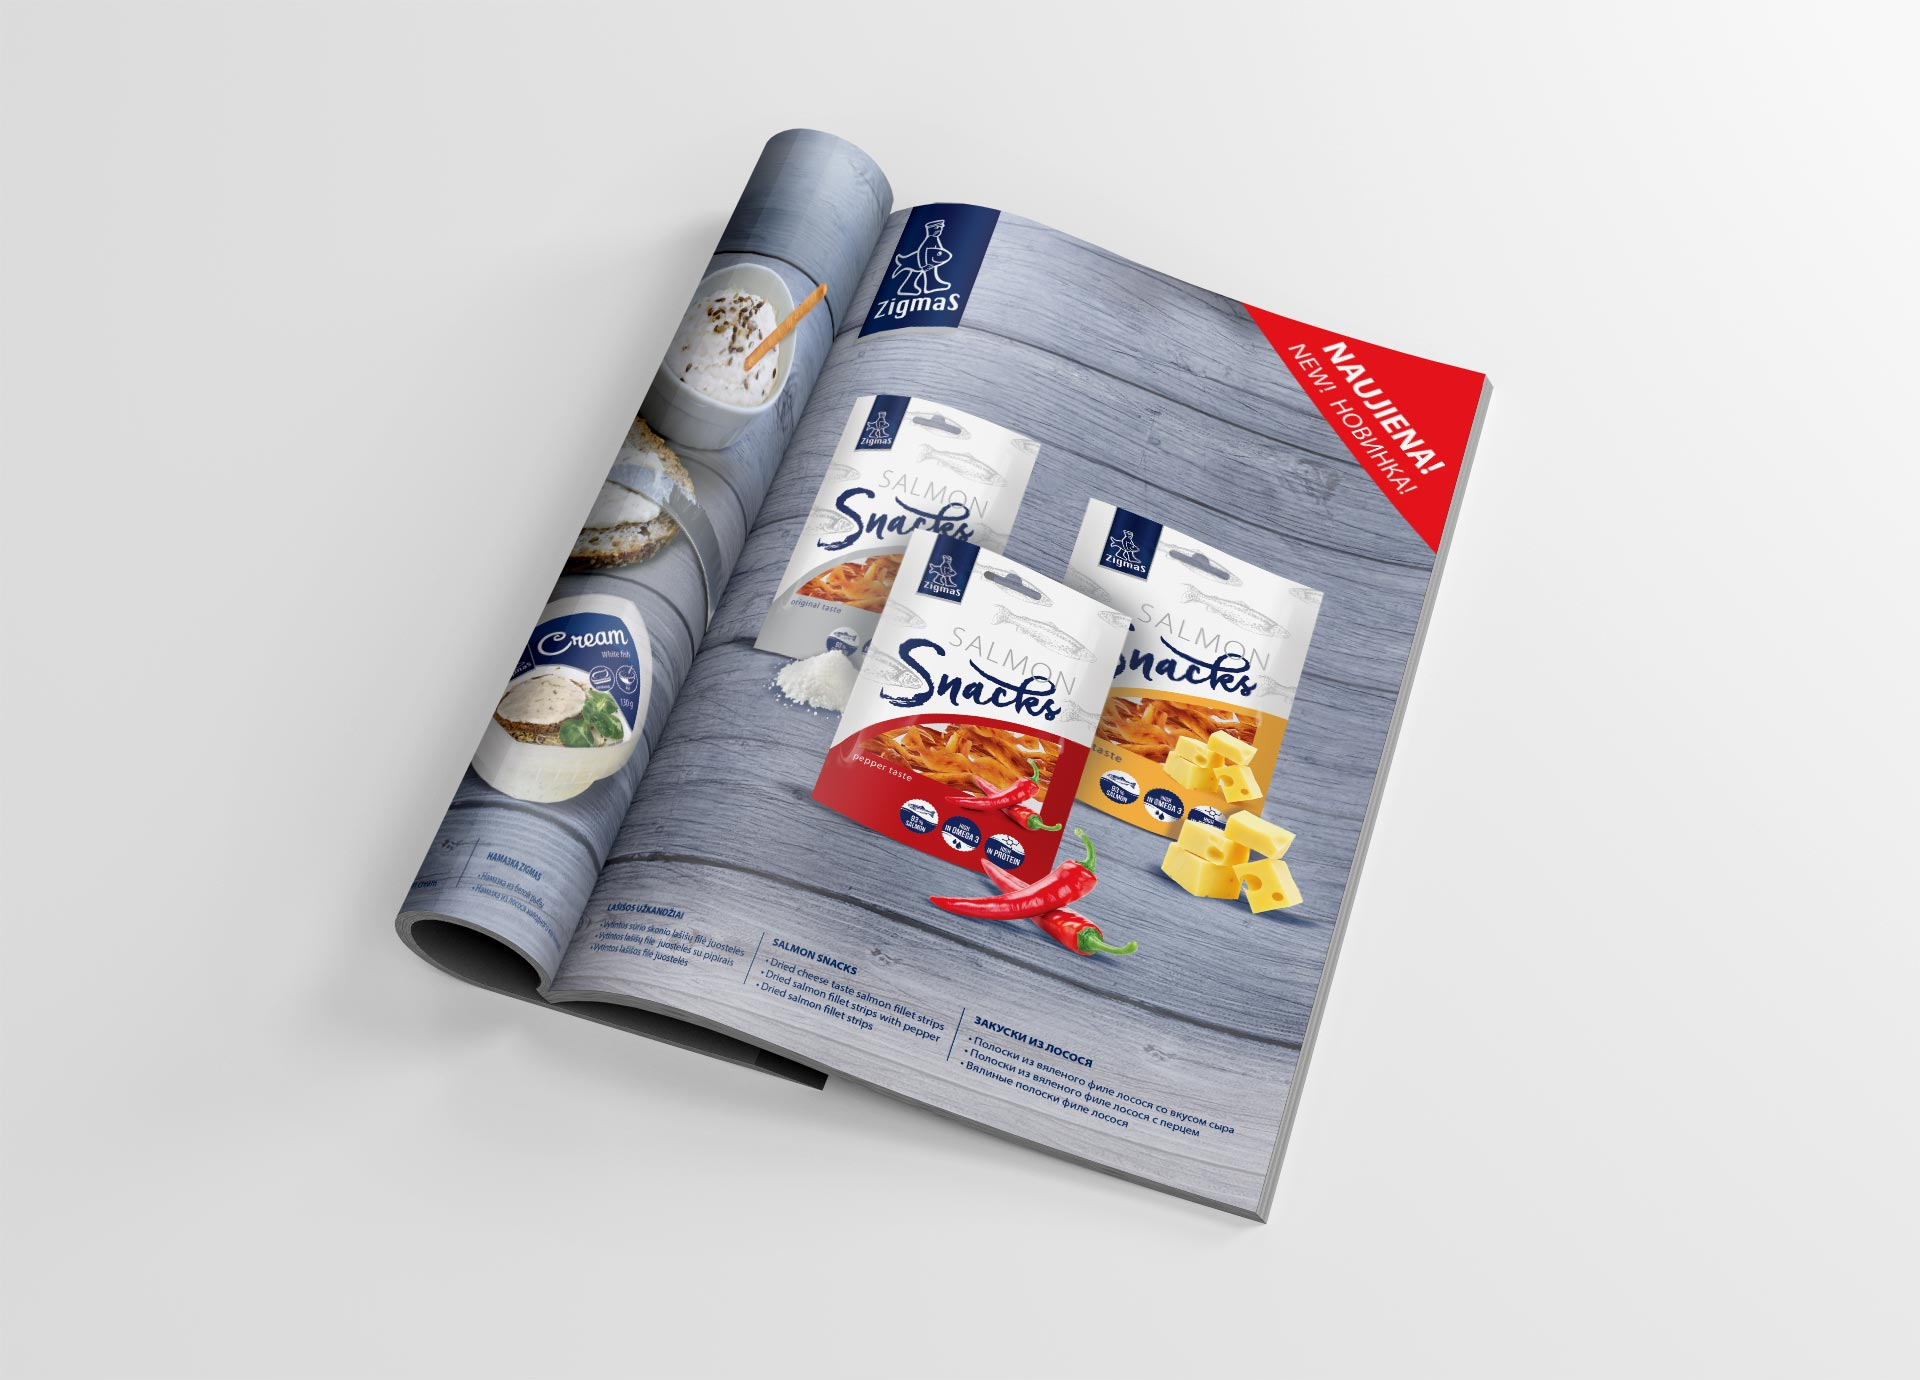 Snacks-zigmas-web-magasine